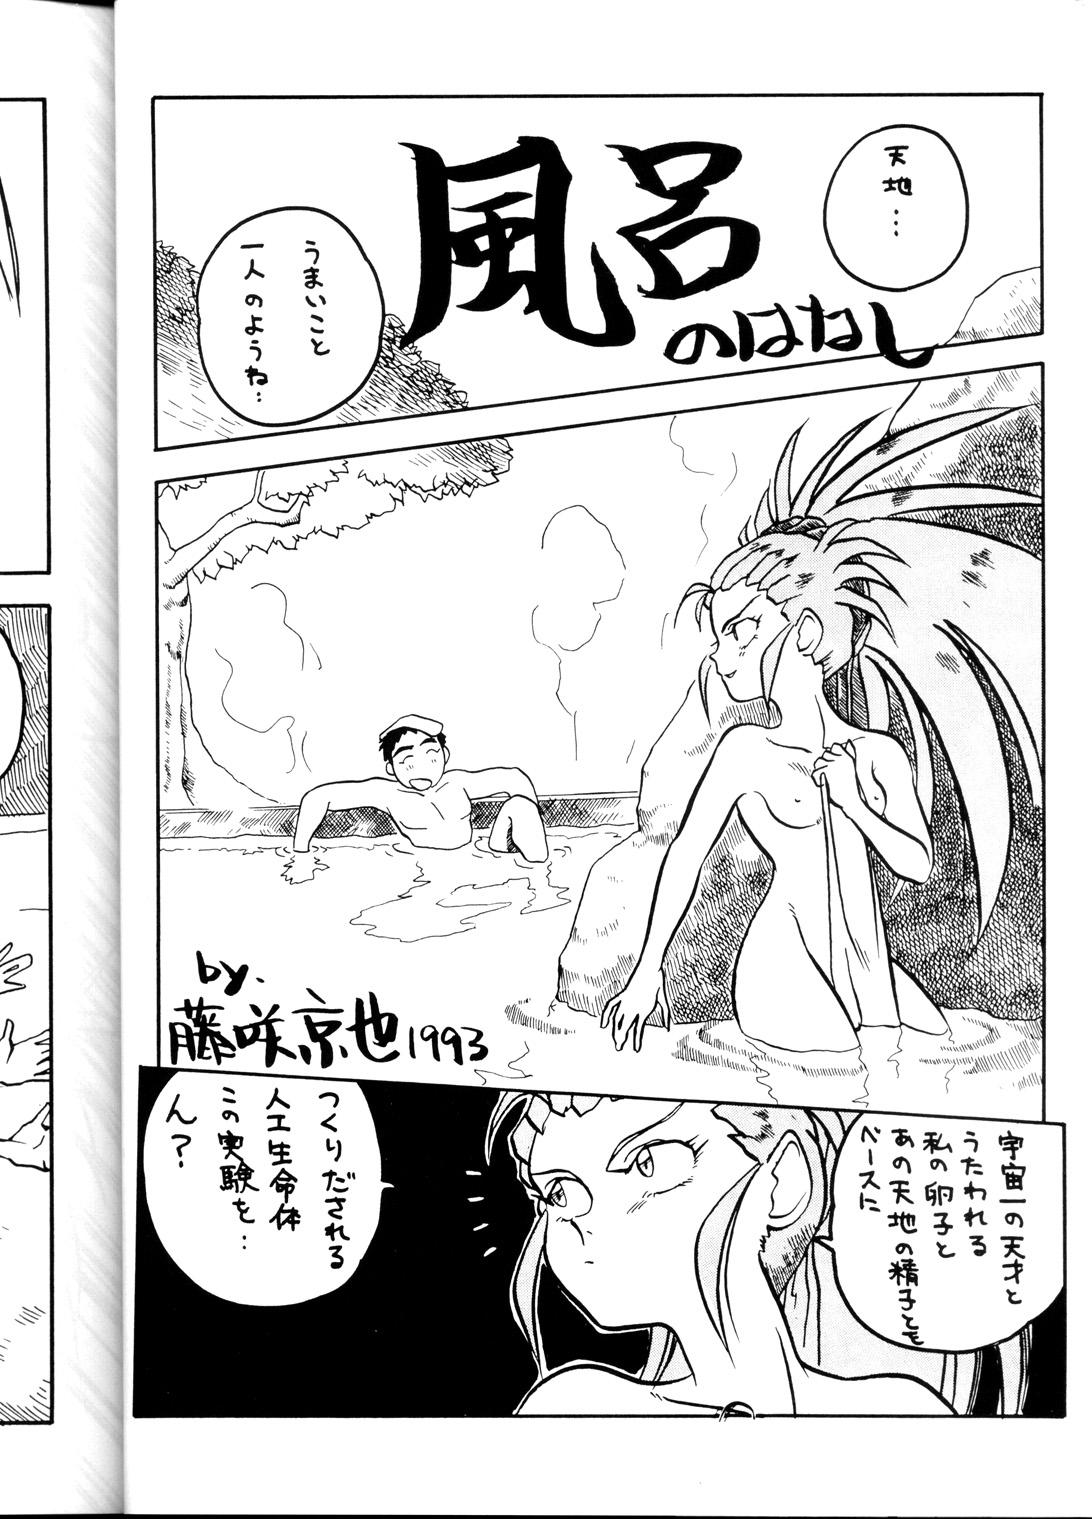 [B.B.C] Tenchi Muyou! Ryou-ou-ki Kaiteiben (Tenchi Muyou!) 30